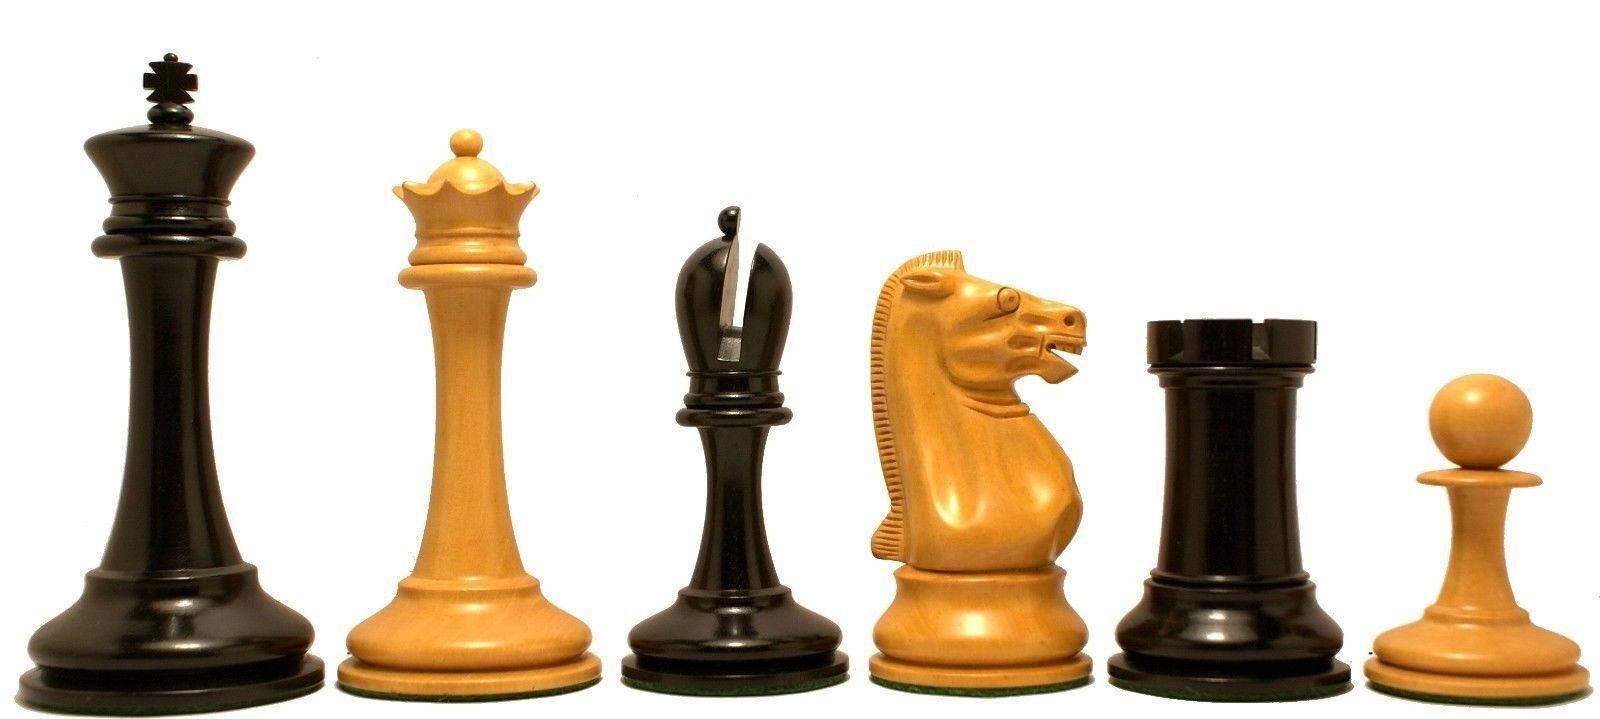 B  & azienda Reproduction Antiqued Premium Staunton 4.4  Ebony Chessmen  presa di fabbrica